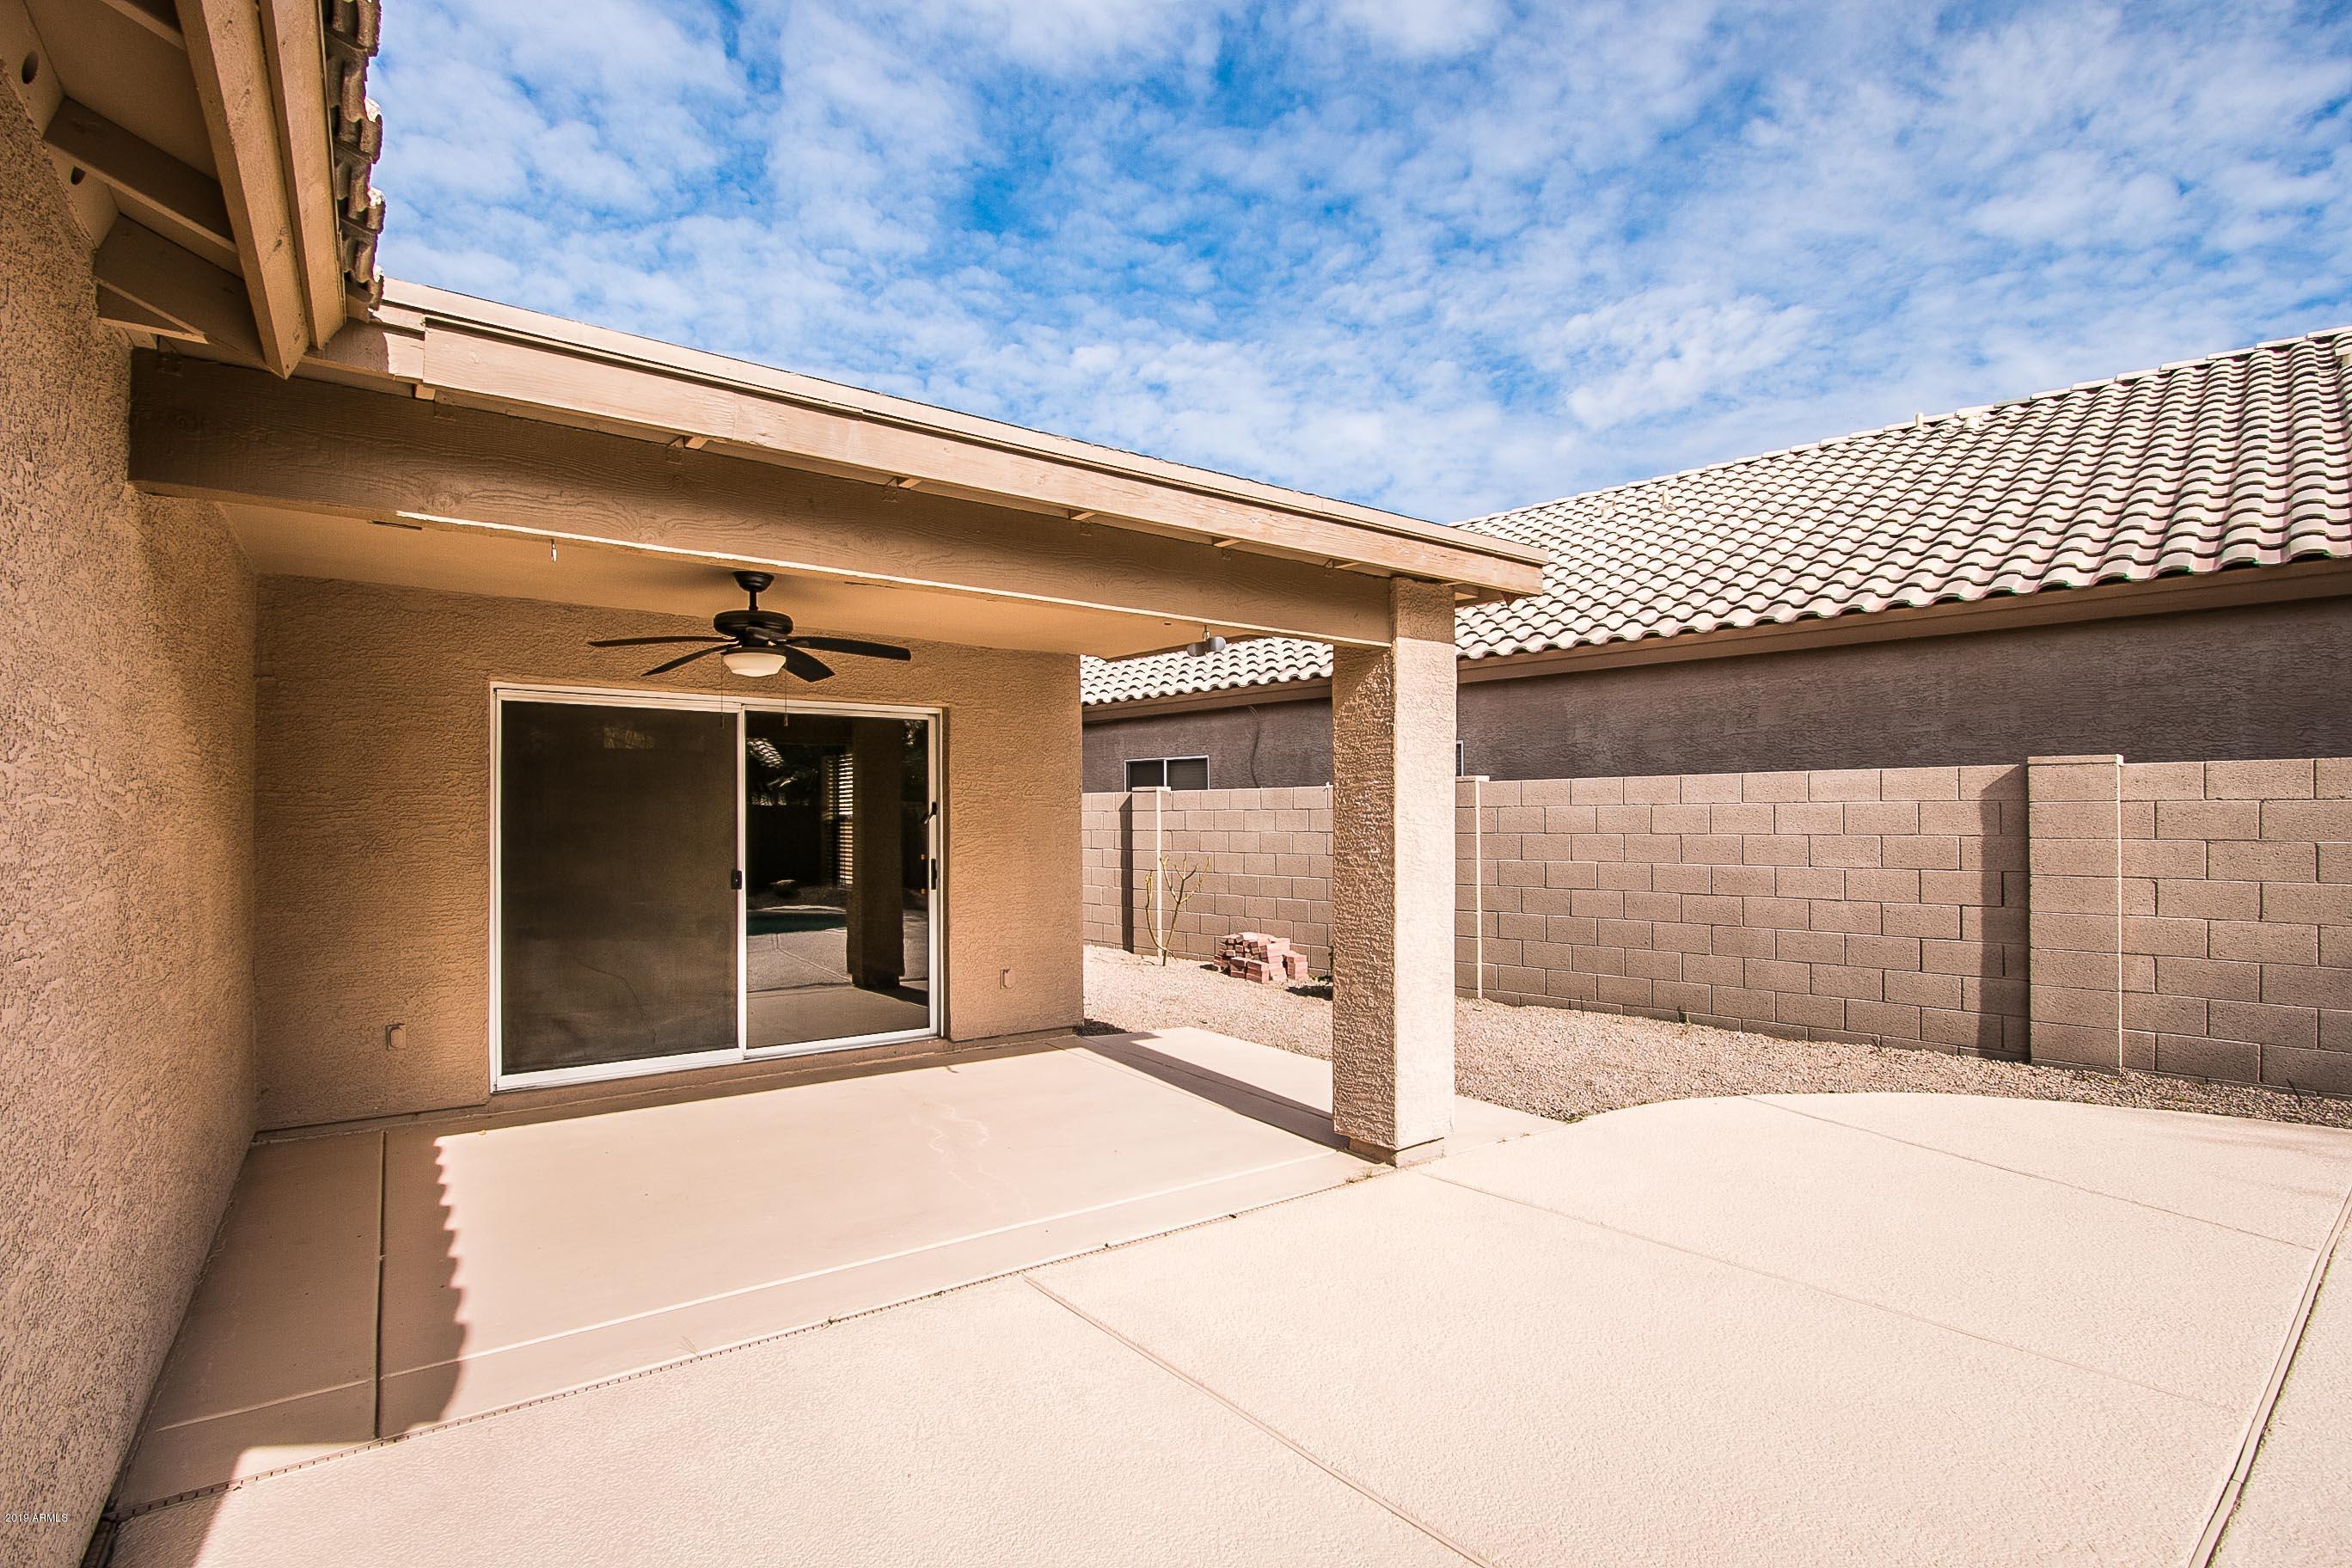 MLS 5880071 4055 W SHANNON Street, Chandler, AZ 85226 Chandler AZ Park Promenade